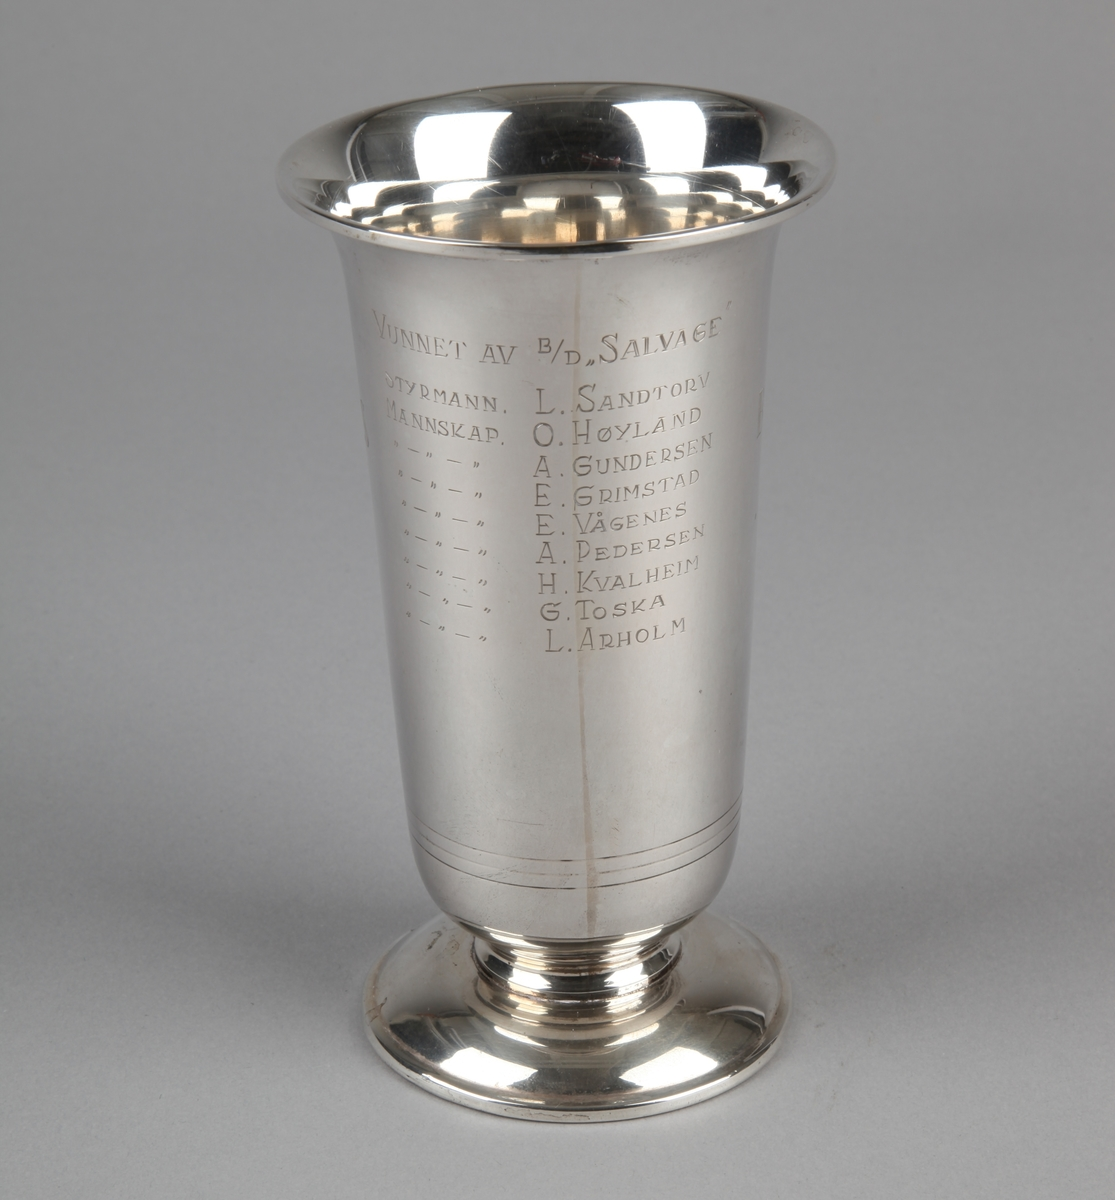 Sølvpokal fra Bergens Rederiforening gitt til bjergningsdamper SALVAGE i 1948.